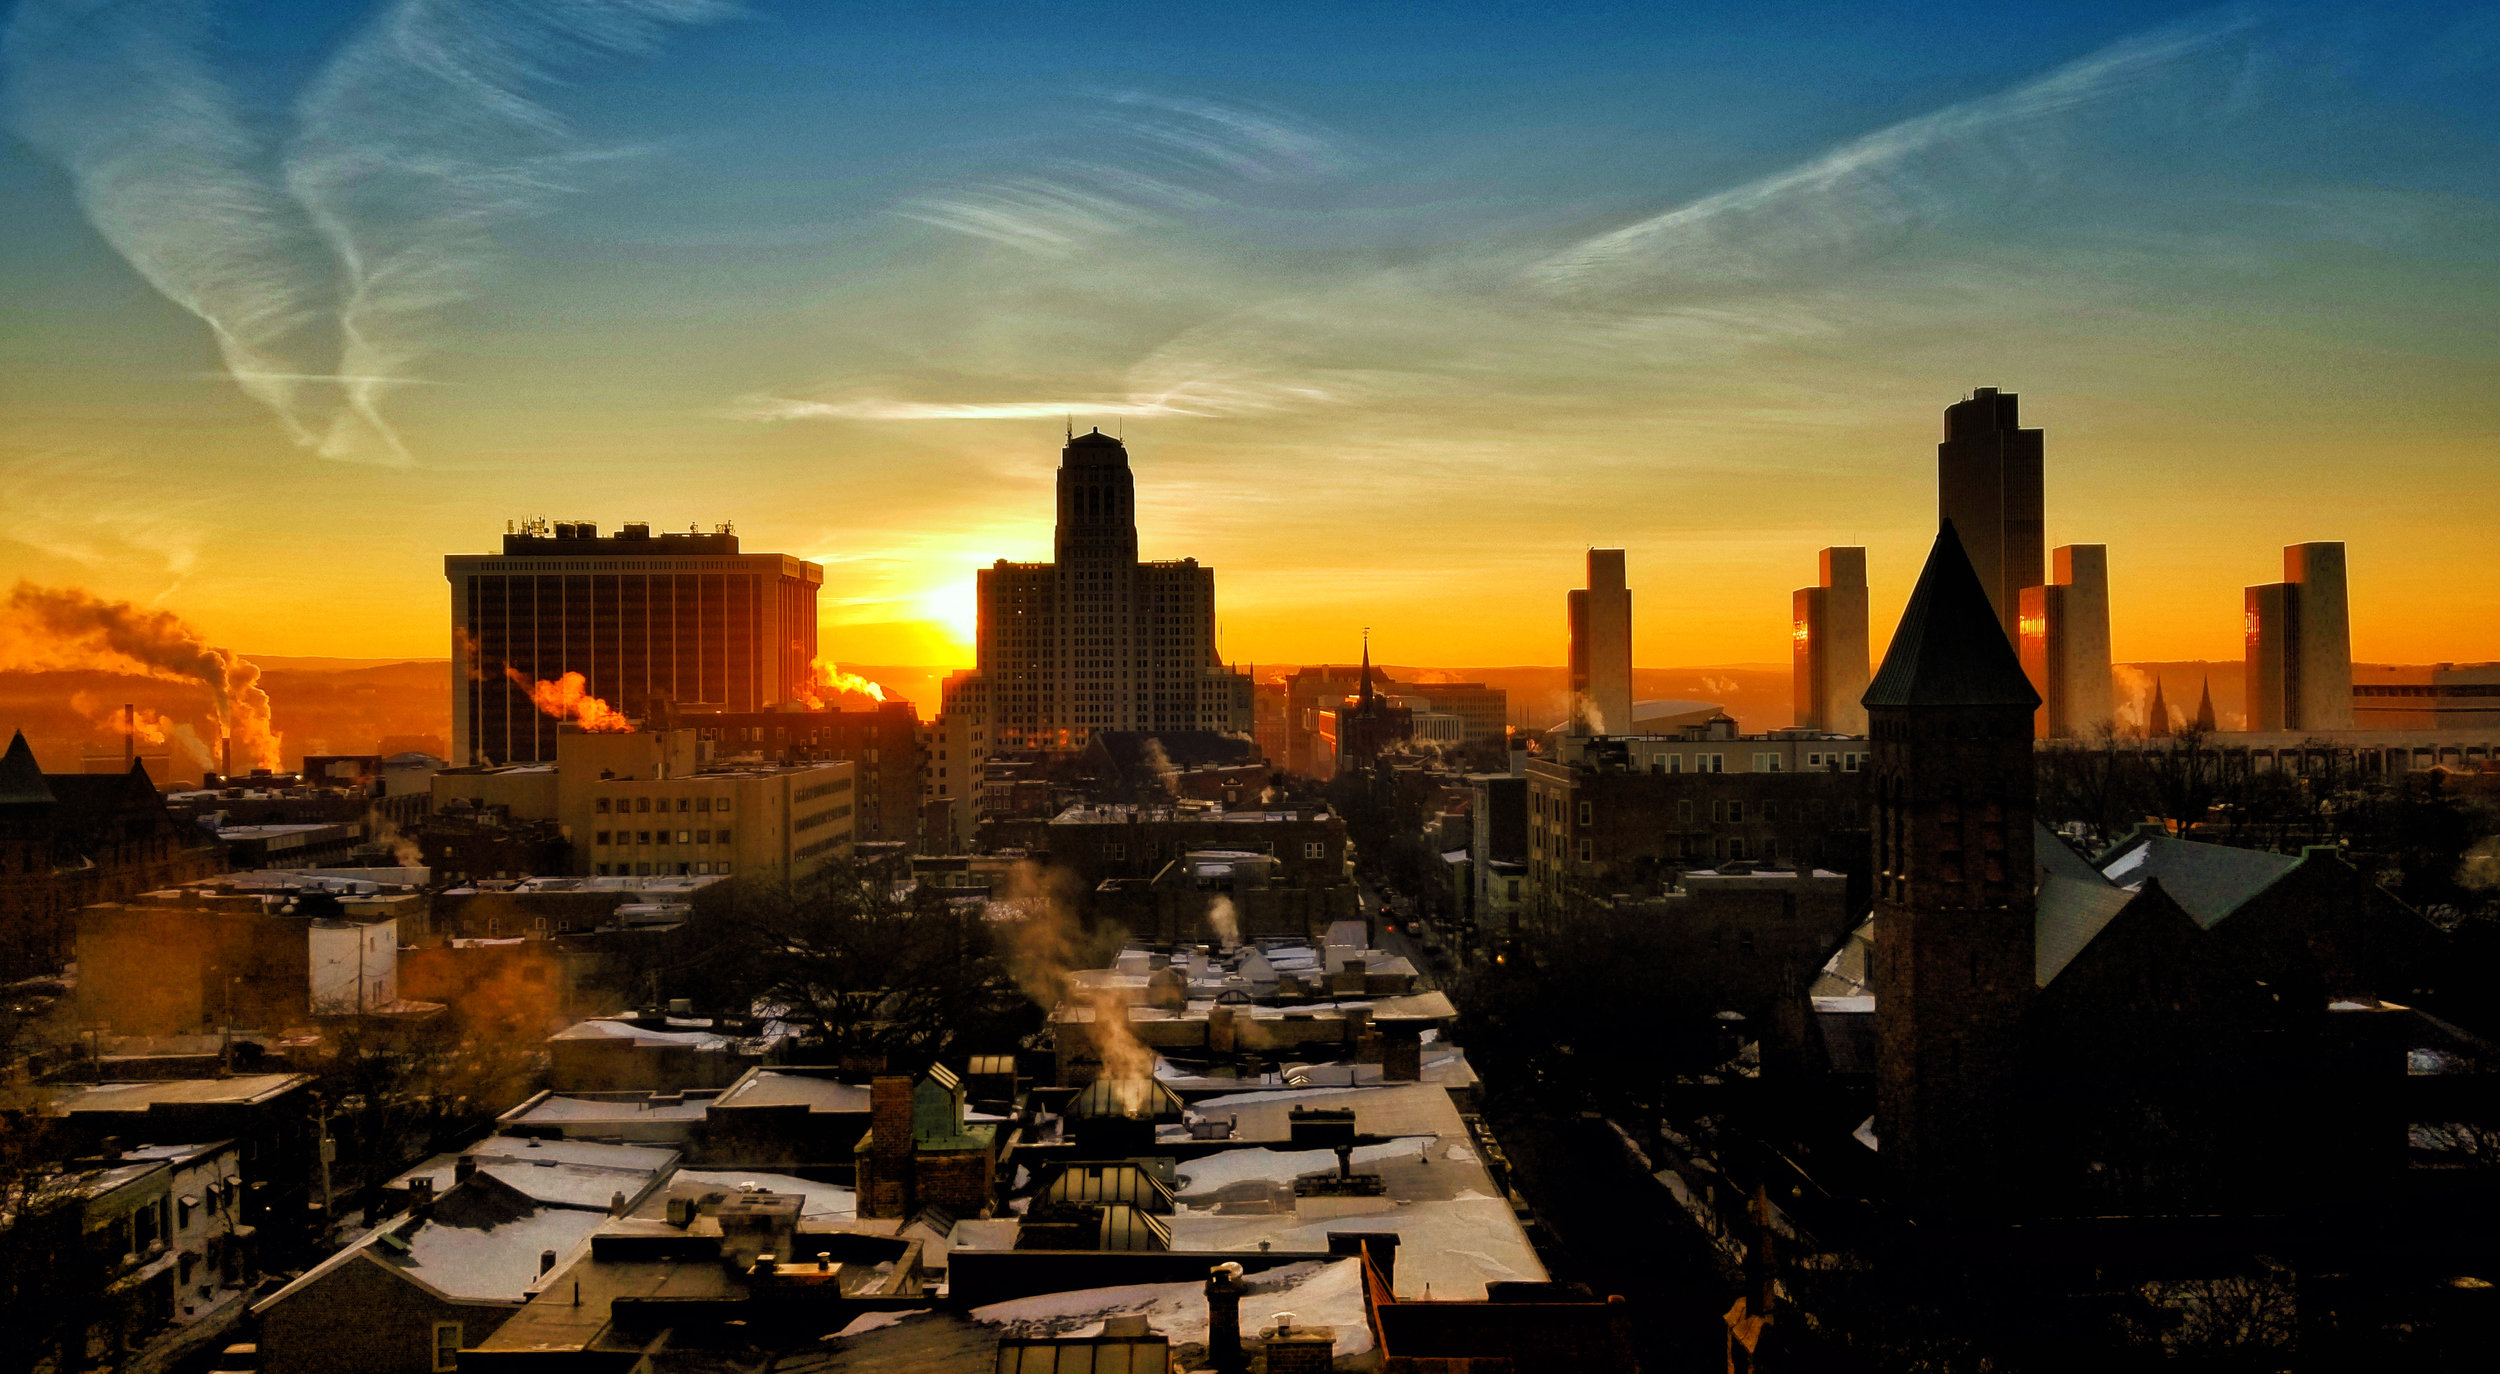 Sunrise Over Albany